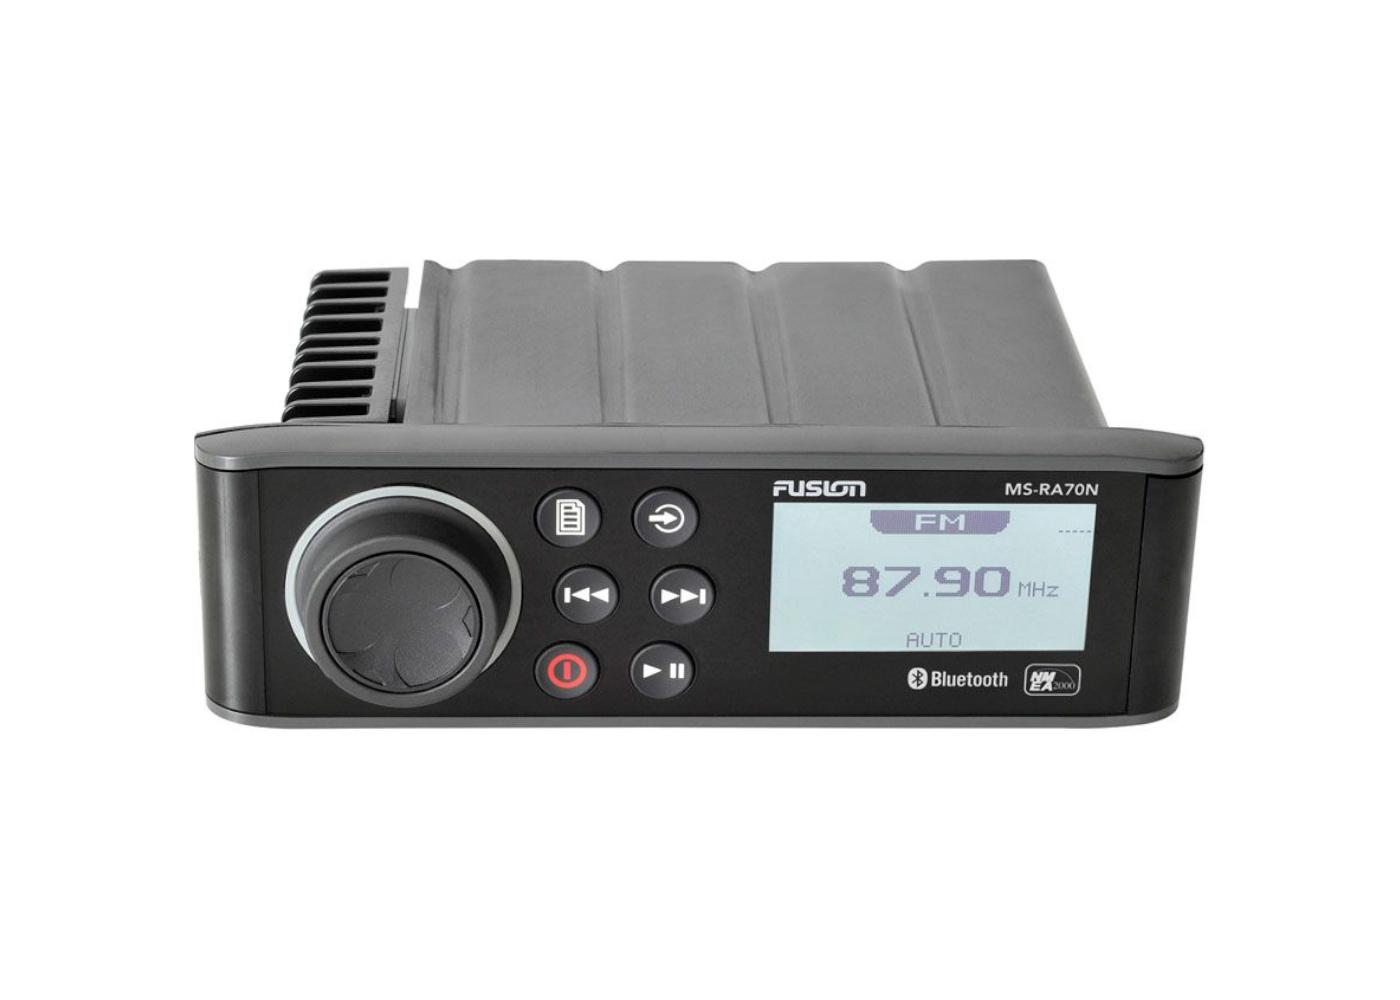 Fusion RA70N Marine Stereo